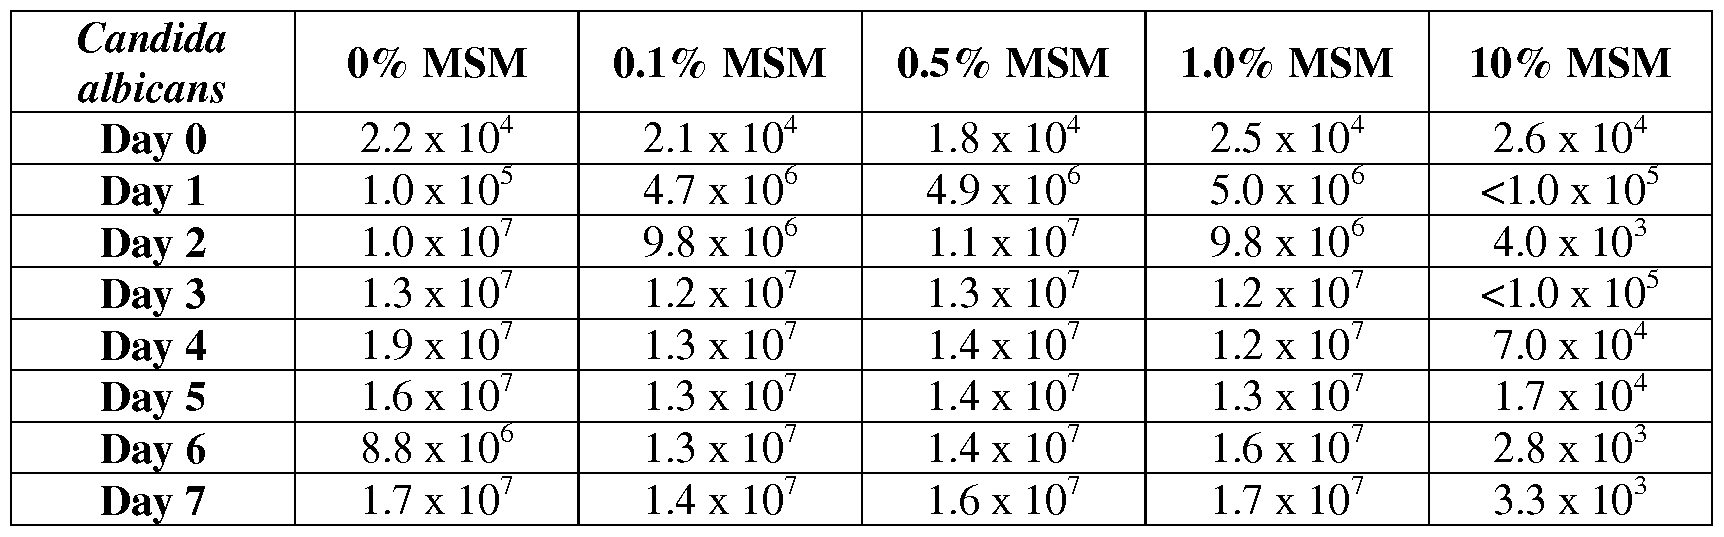 WO2011053854A1 - Use of methylsulfonylmethane (msm) to modulate